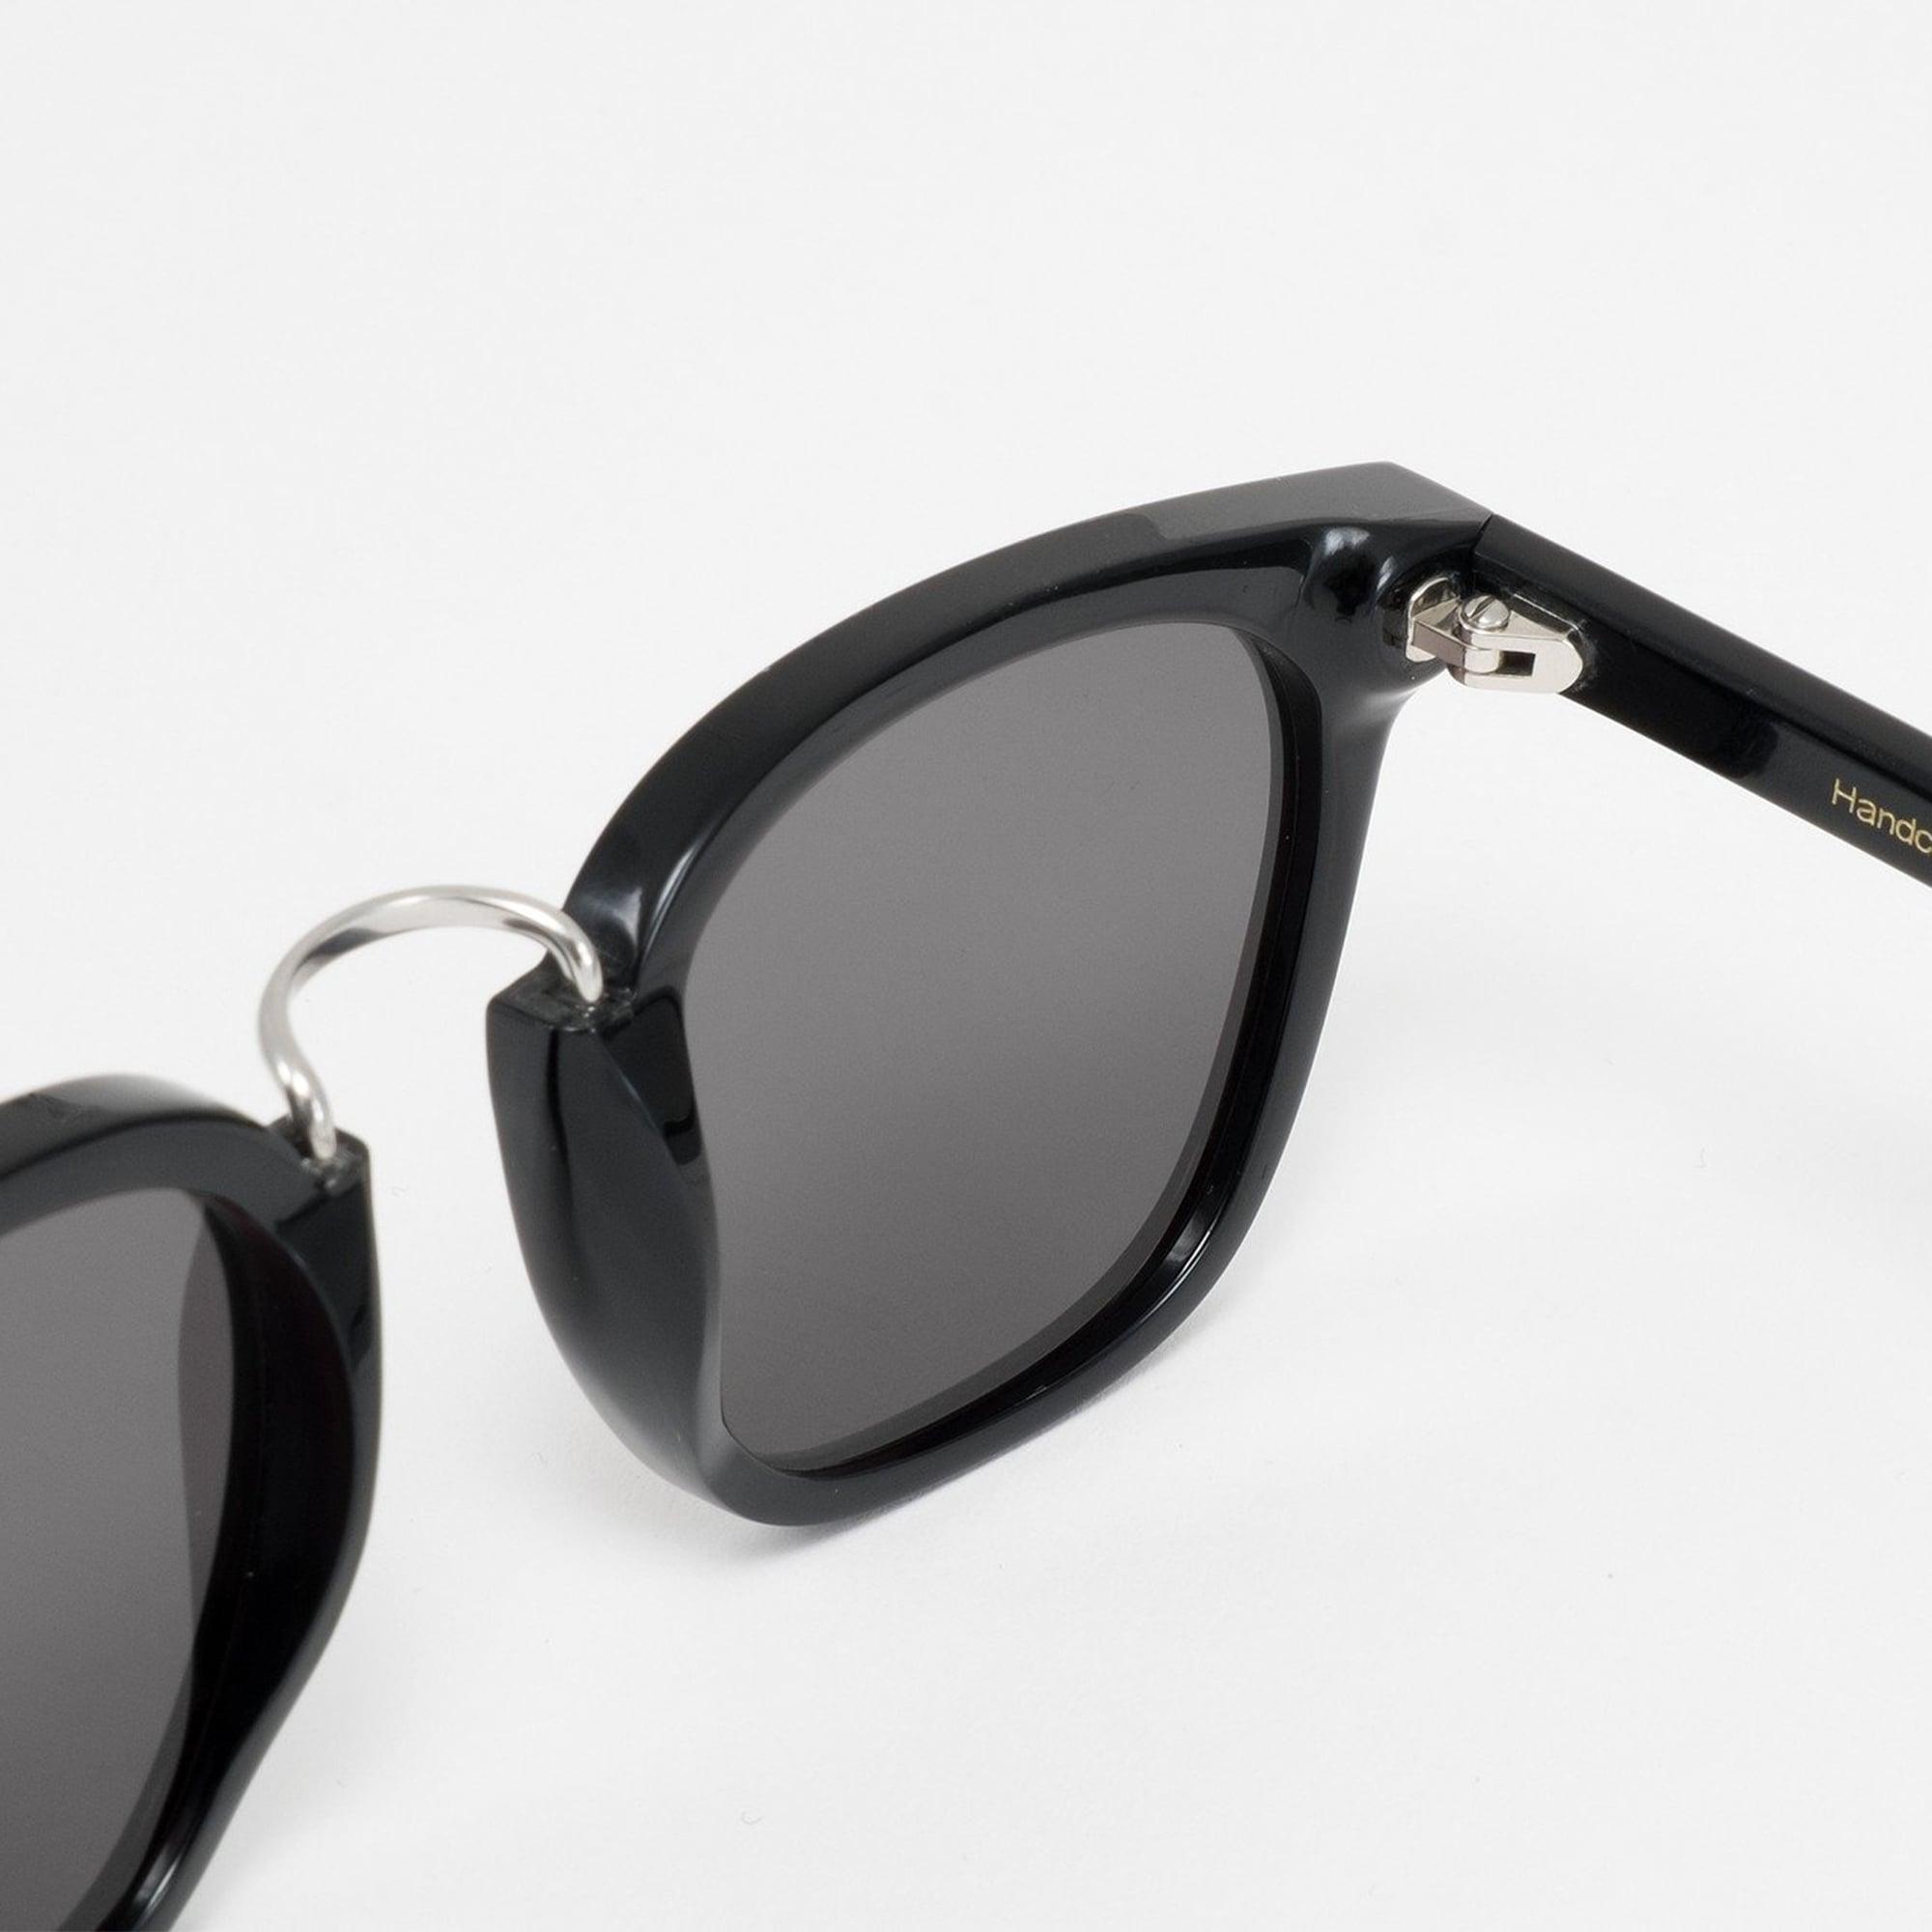 b9e5d12df1e56 Monokel Eyewear Ando Sunglasses (Black) at Dandy Fellow